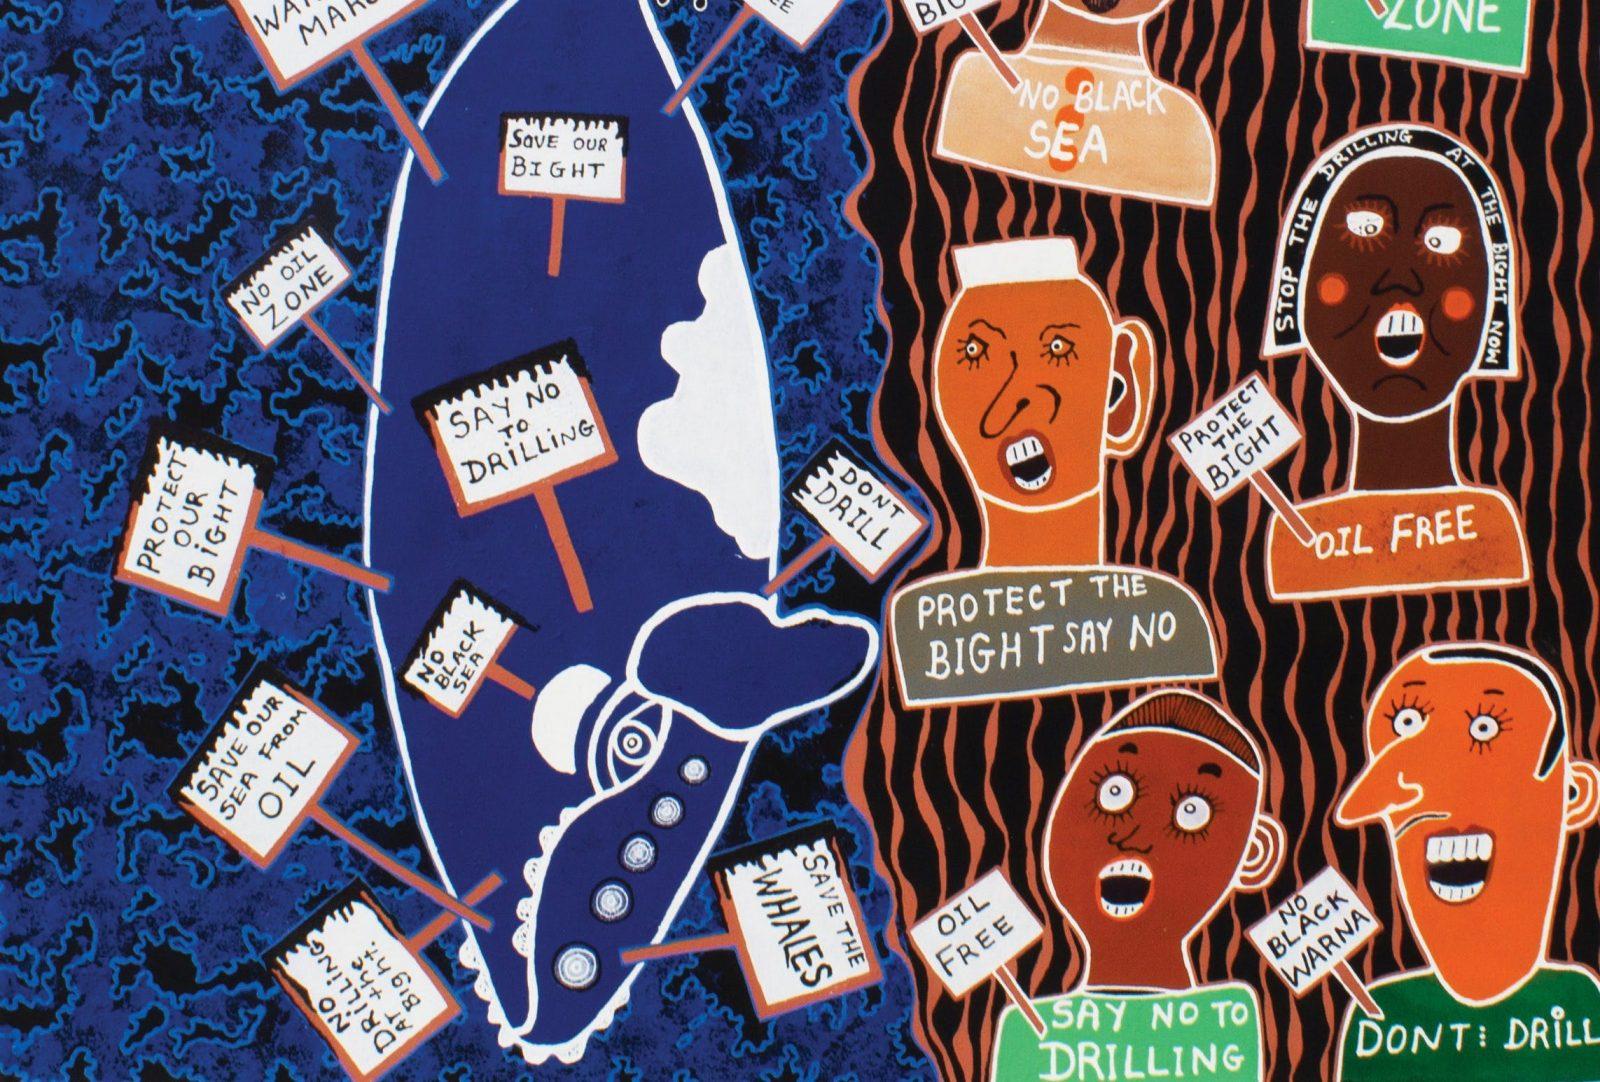 Chistine Tschuna, poster image